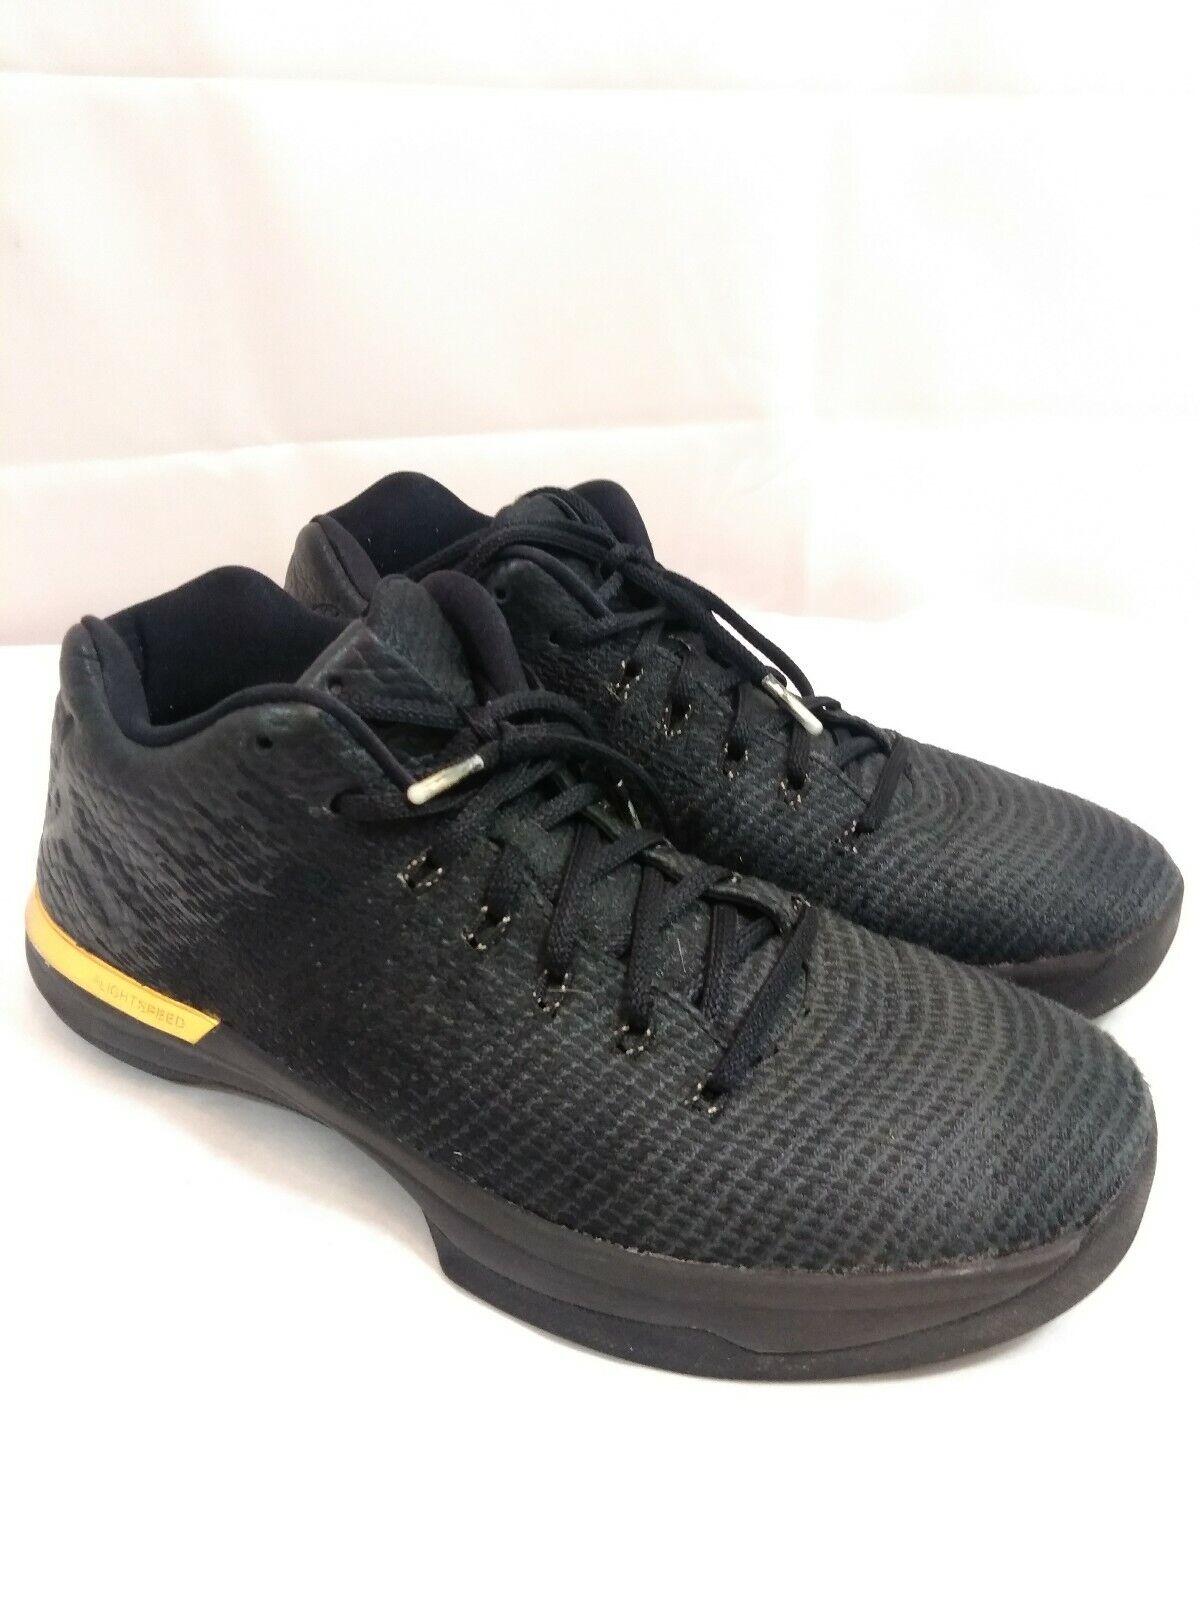 low priced 38cfe 4c894 Nike Air Jordan XXXI 31 Low Men's Basketball Black Gold Shoes 897564 023 SZ  10